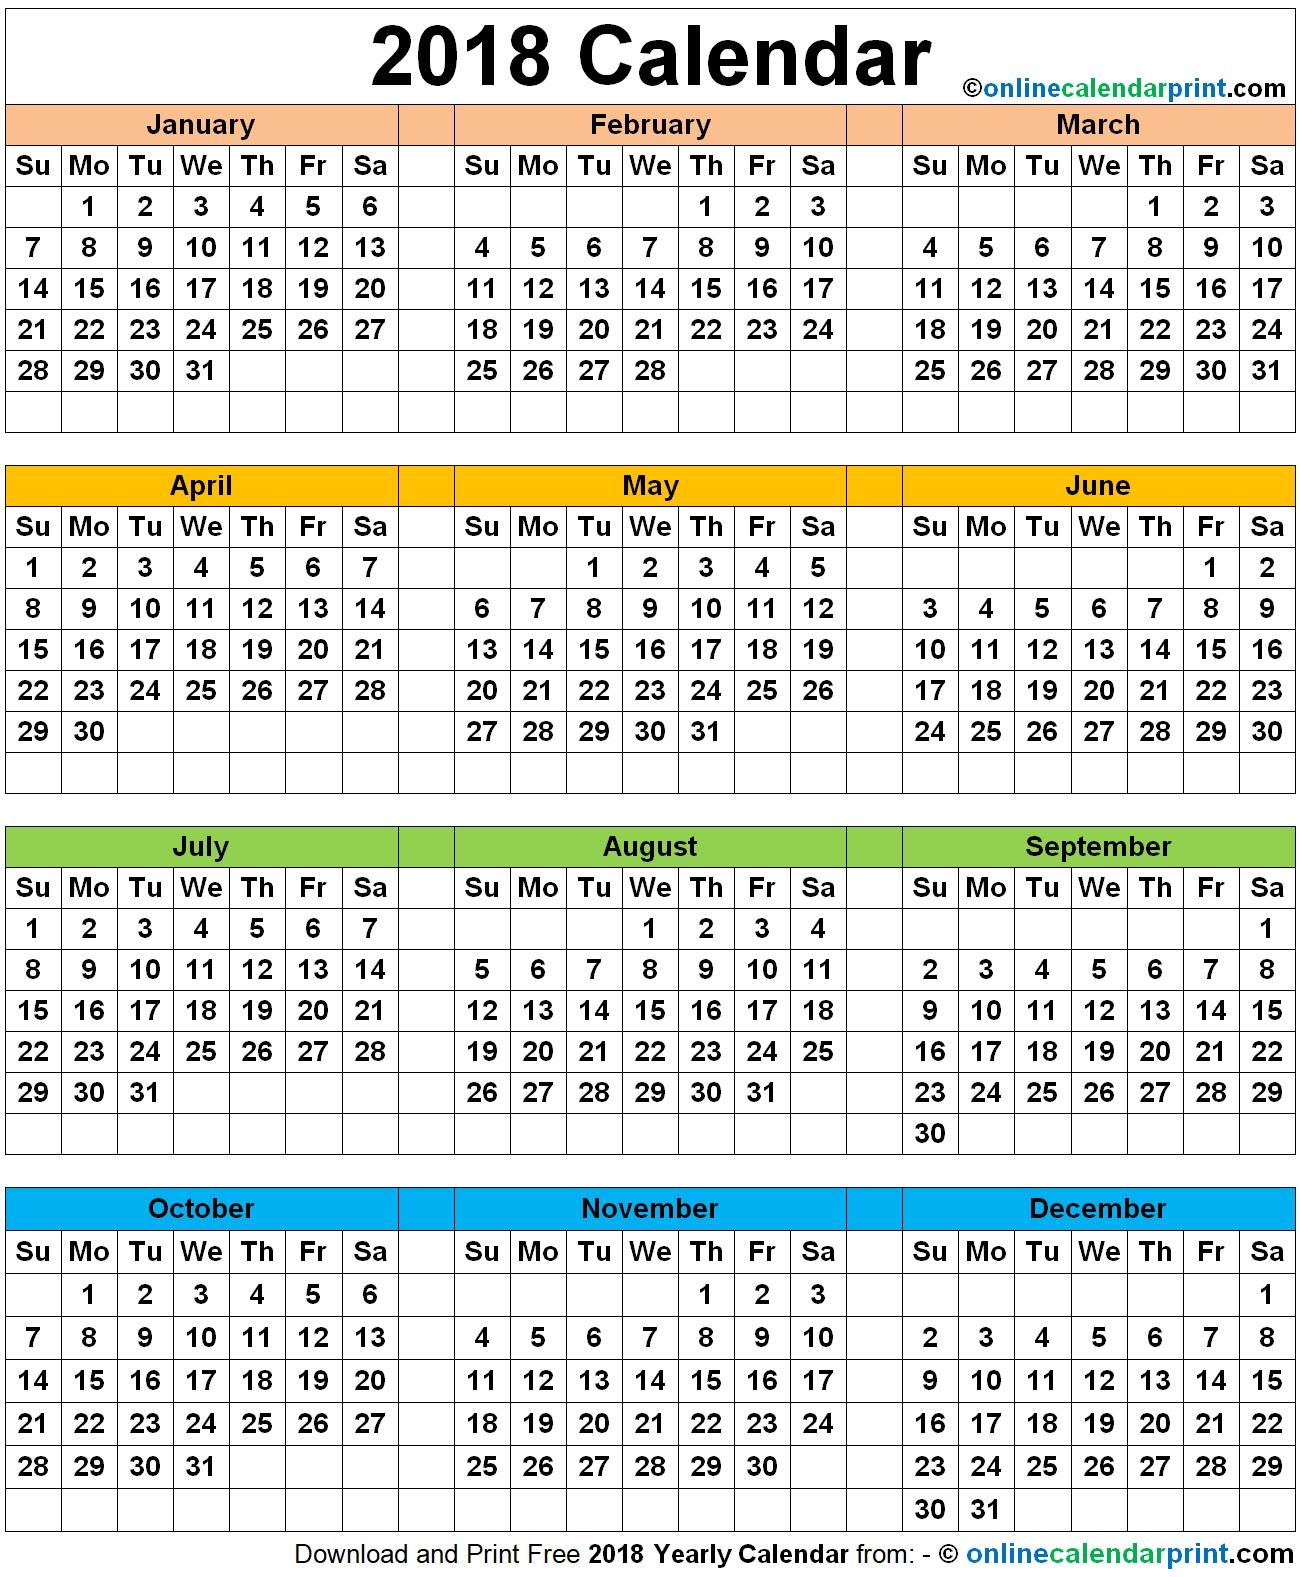 12 month calendar printable one page 2018 2018 12 Month Calendar Image erdferdf